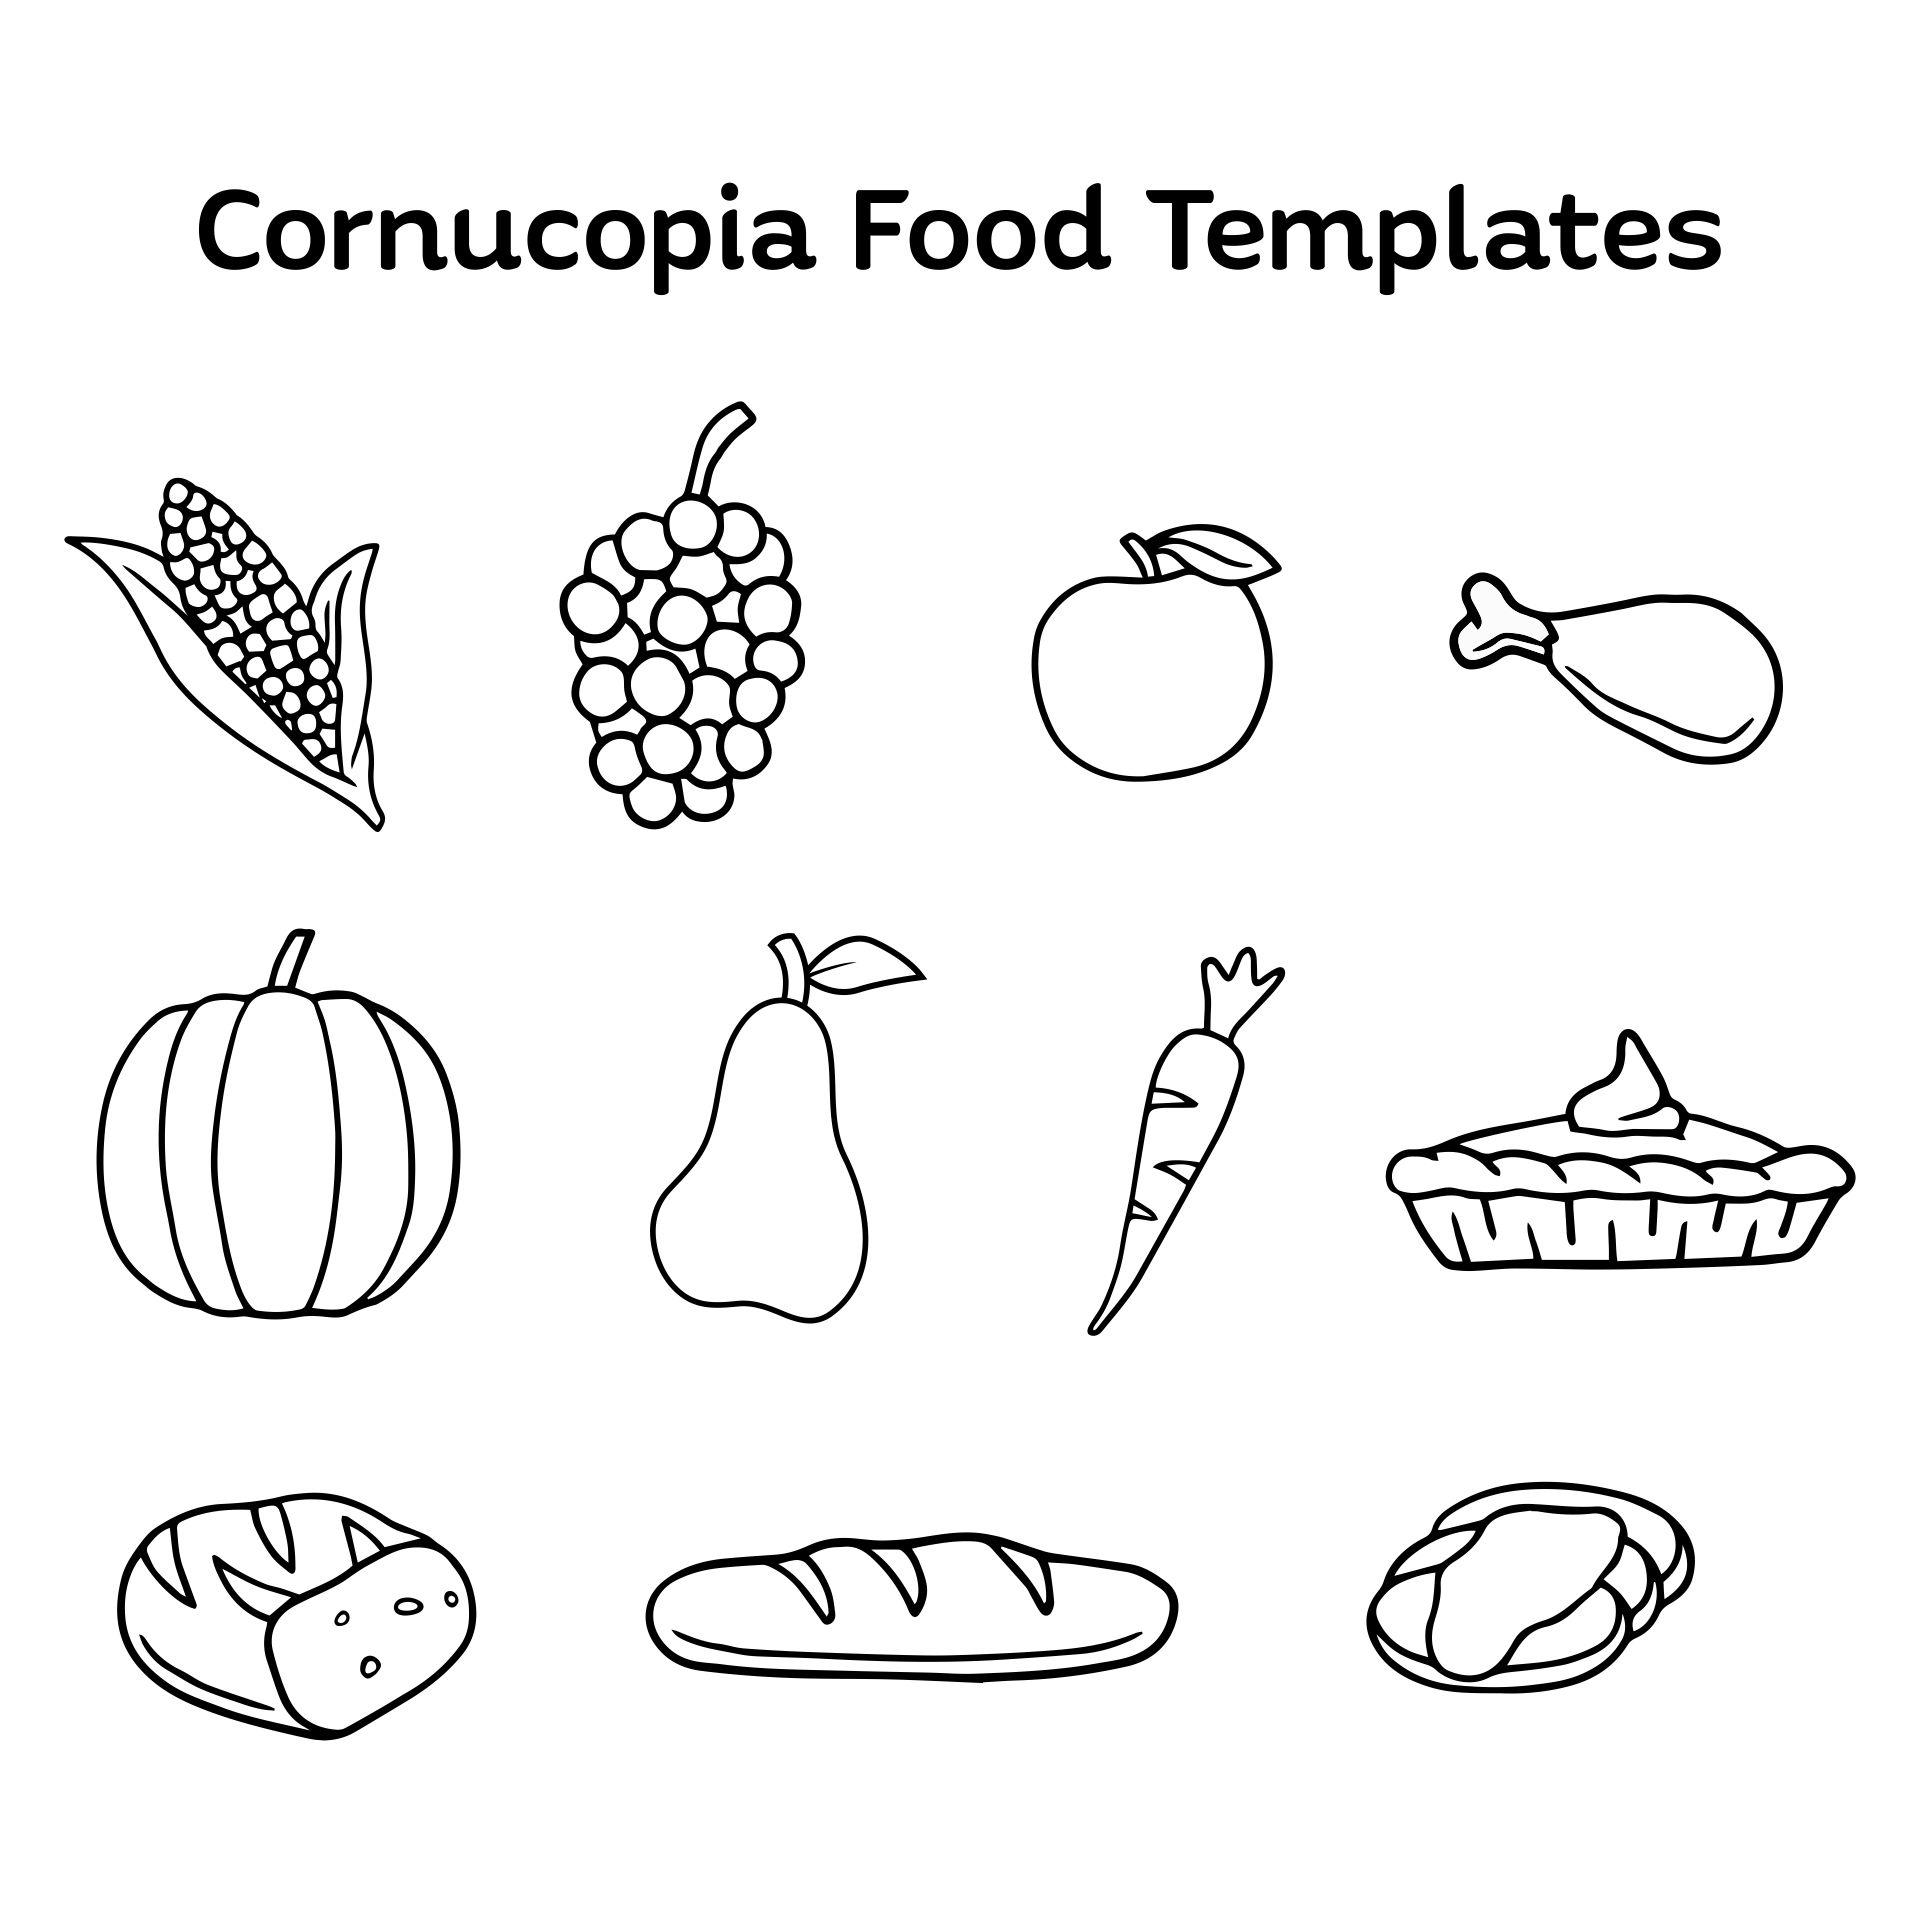 Cornucopia Food Printables Templates